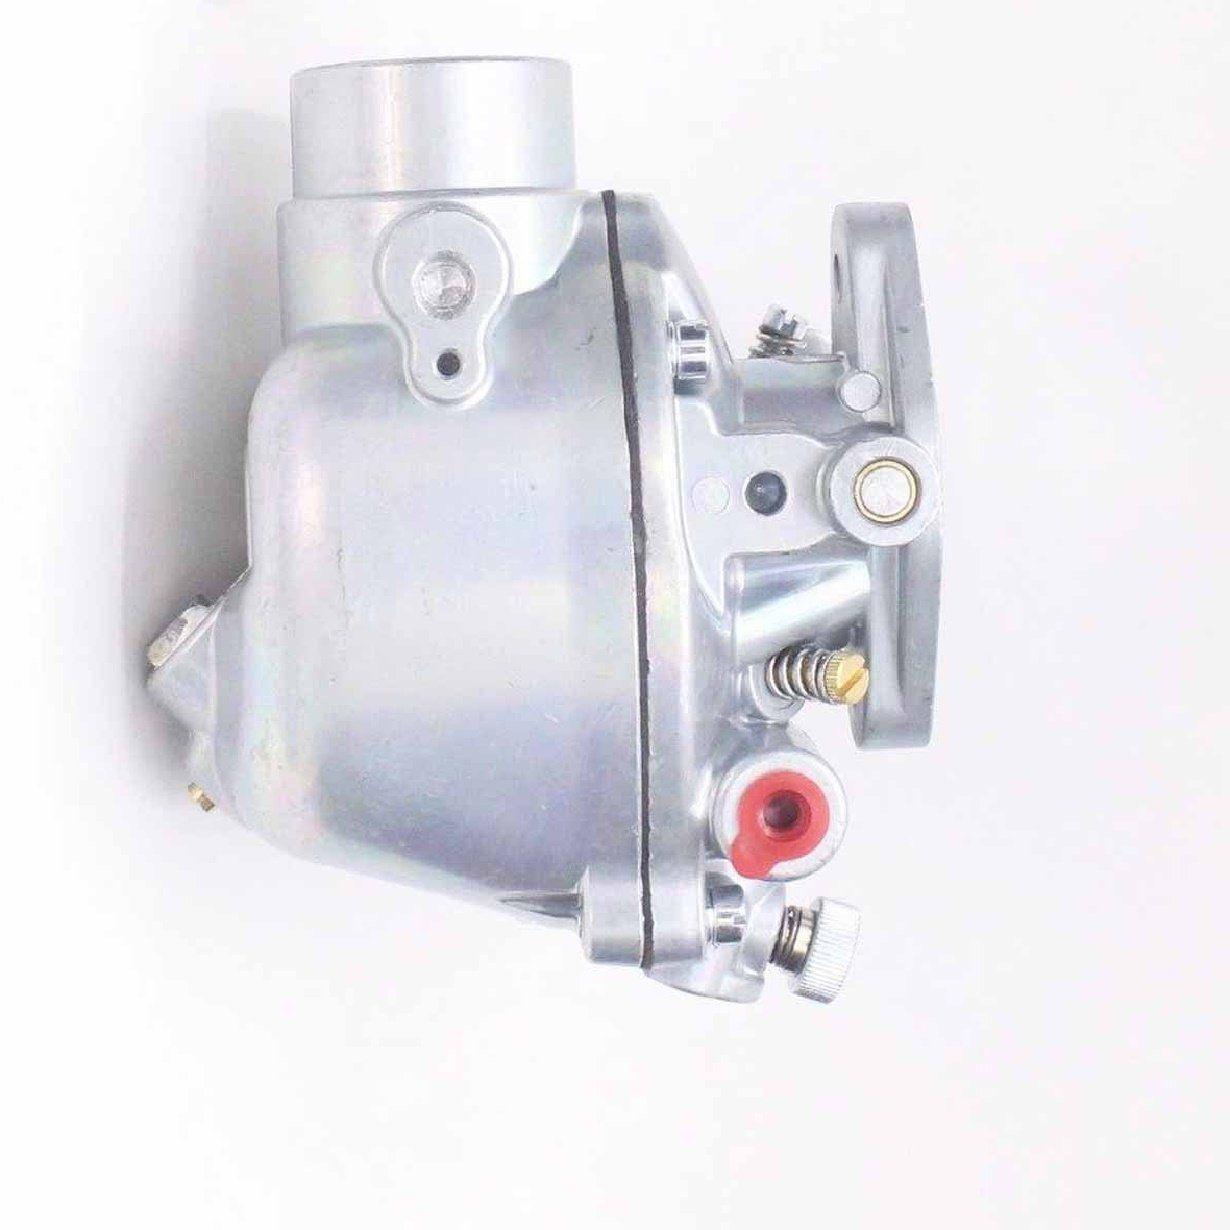 Carburetor Eae9510c For Ford Jubilee Naa Nab Tractor Eae9510c